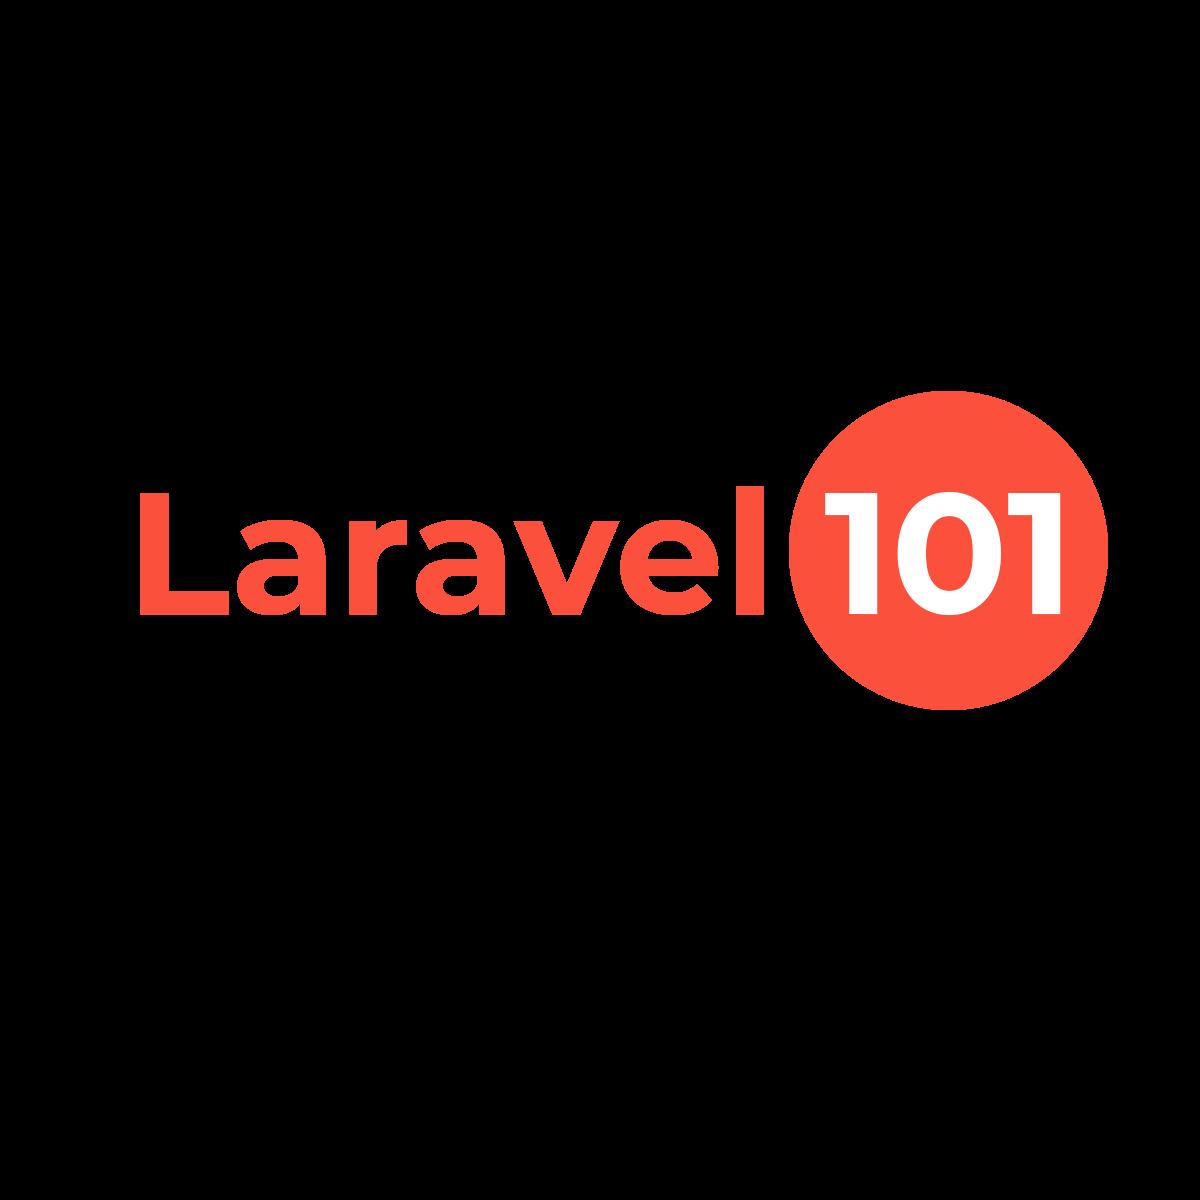 Laravel101